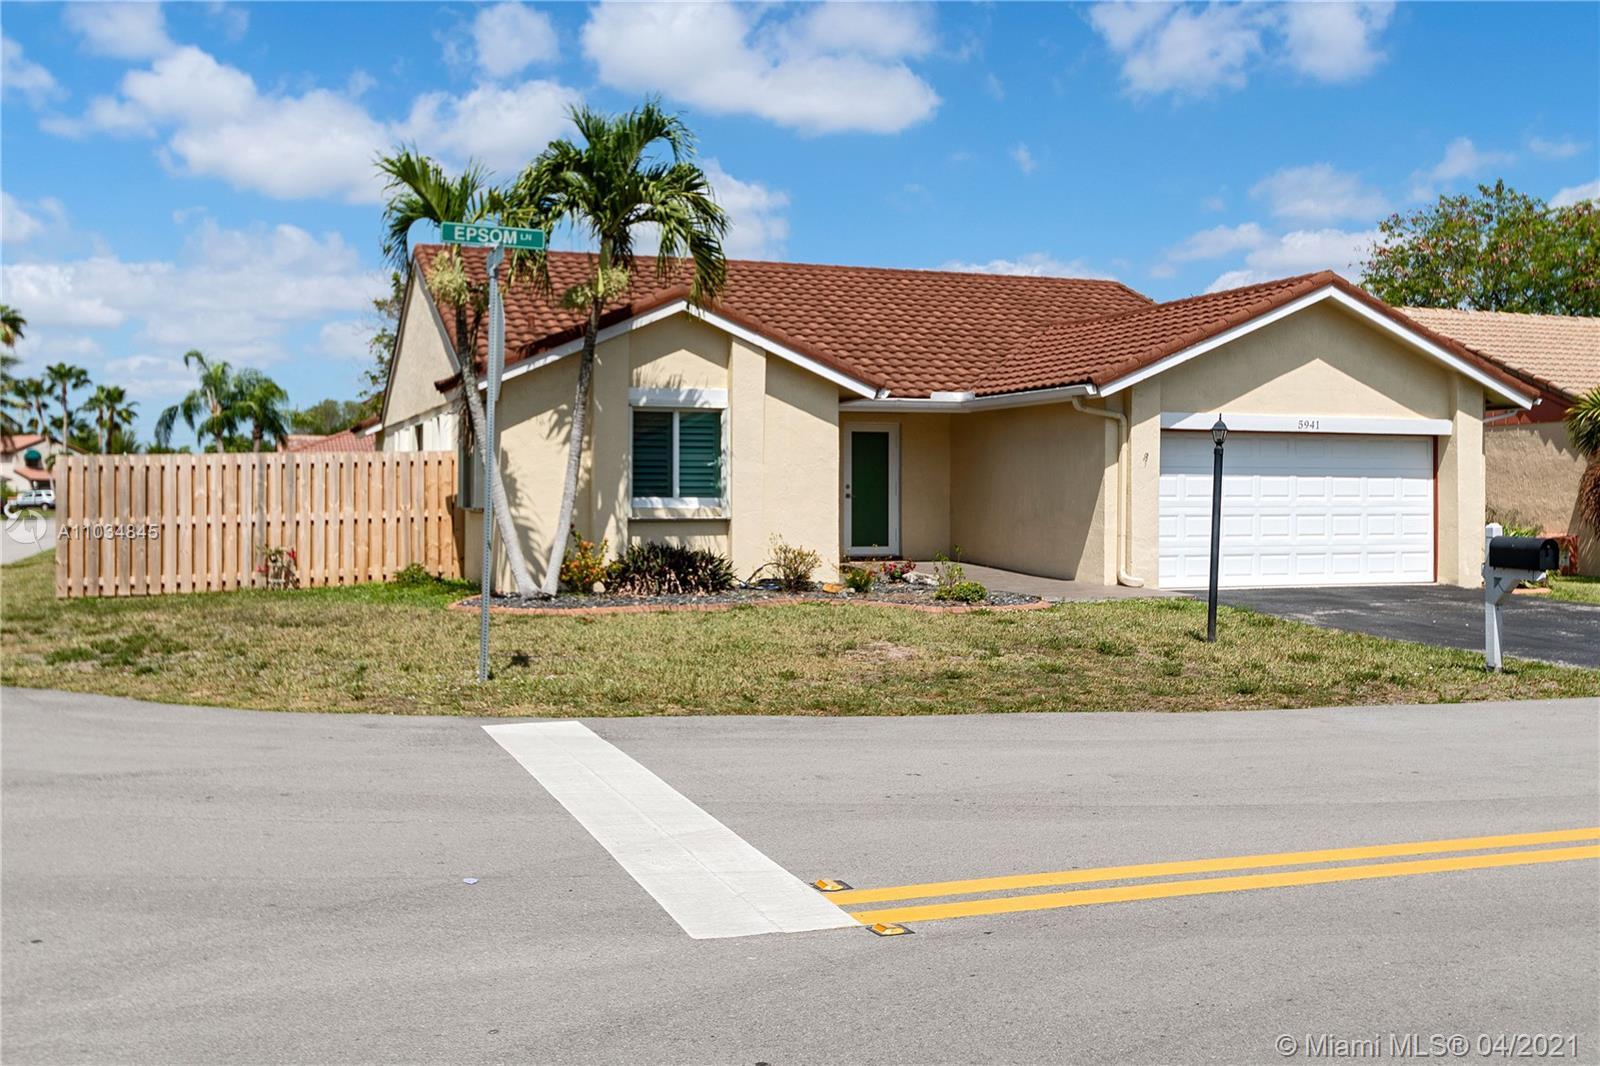 Hawkes Bluff - 5941 Epsom Ln, Davie, FL 33331